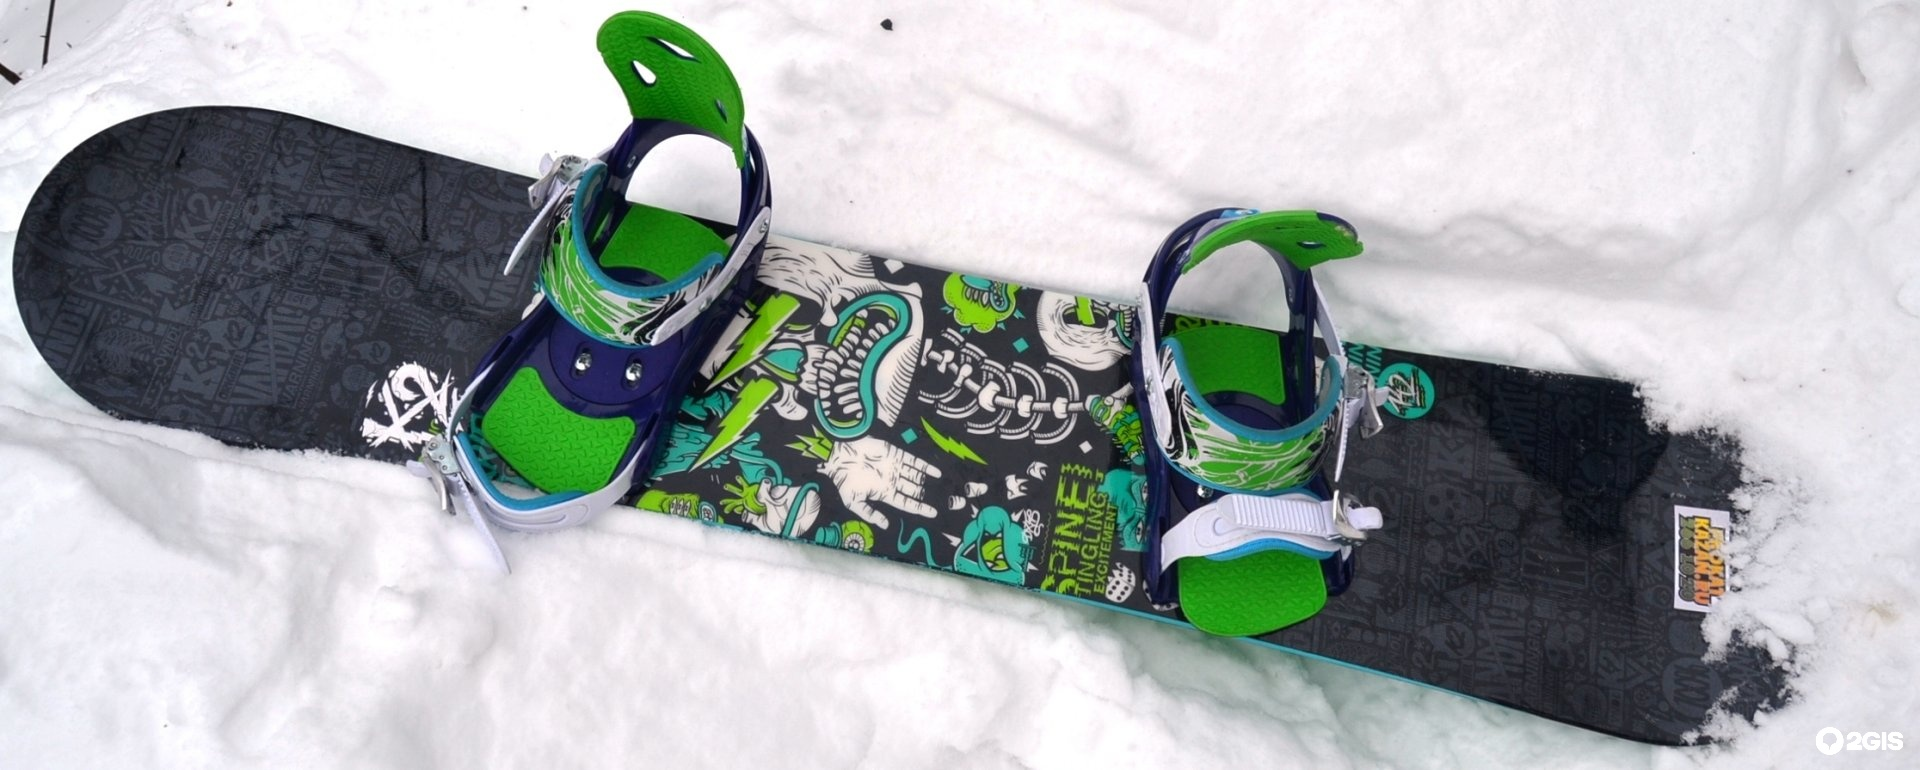 сноуборд купить саратов бу